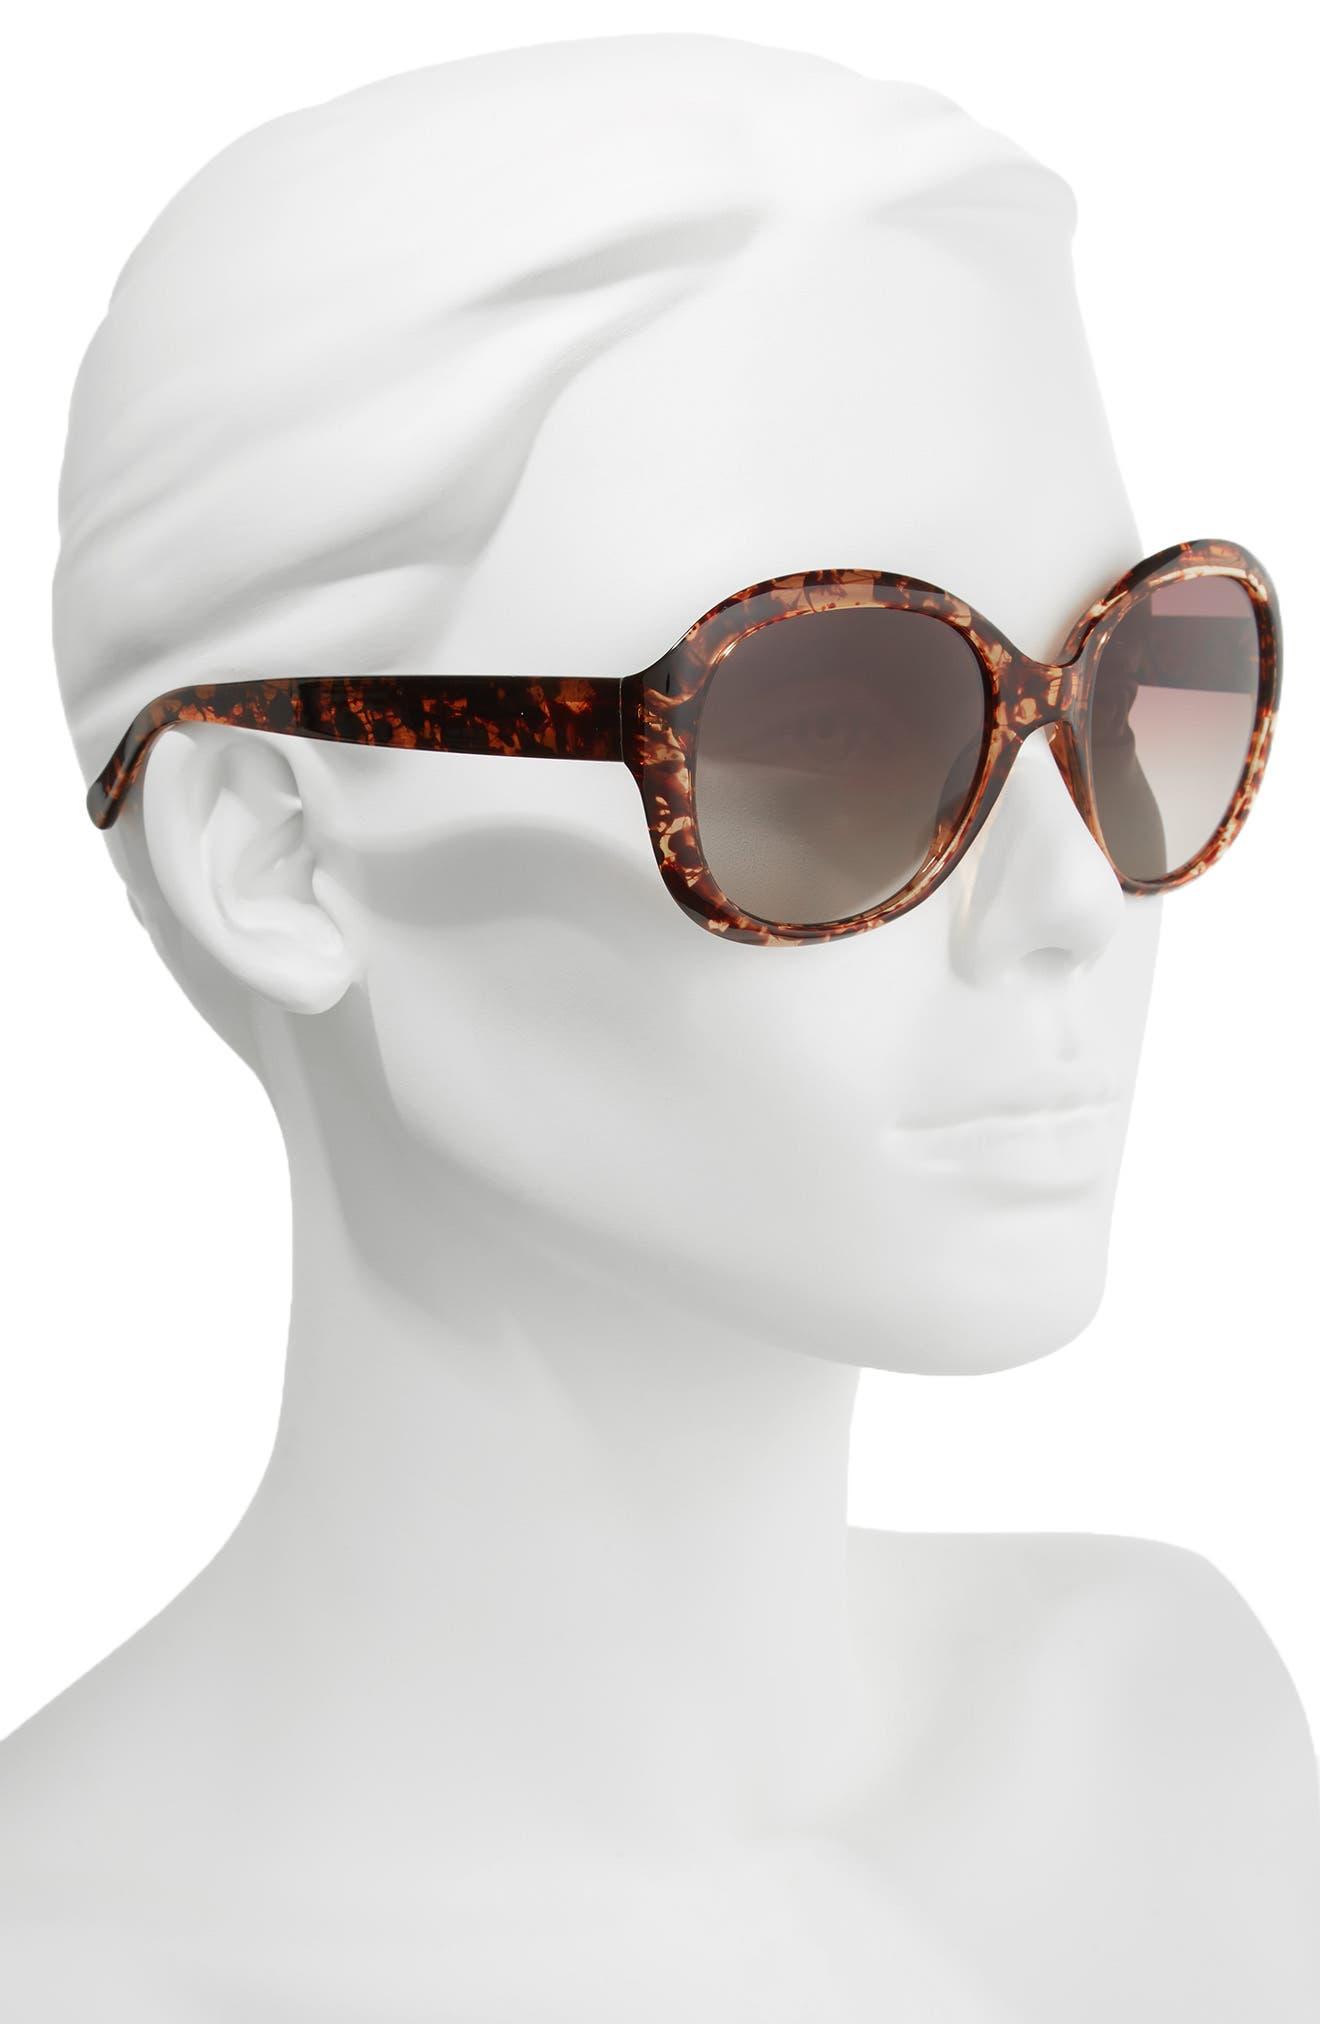 Magnolia 57mm Polarized Round Sunglasses,                             Alternate thumbnail 2, color,                             HAVANA